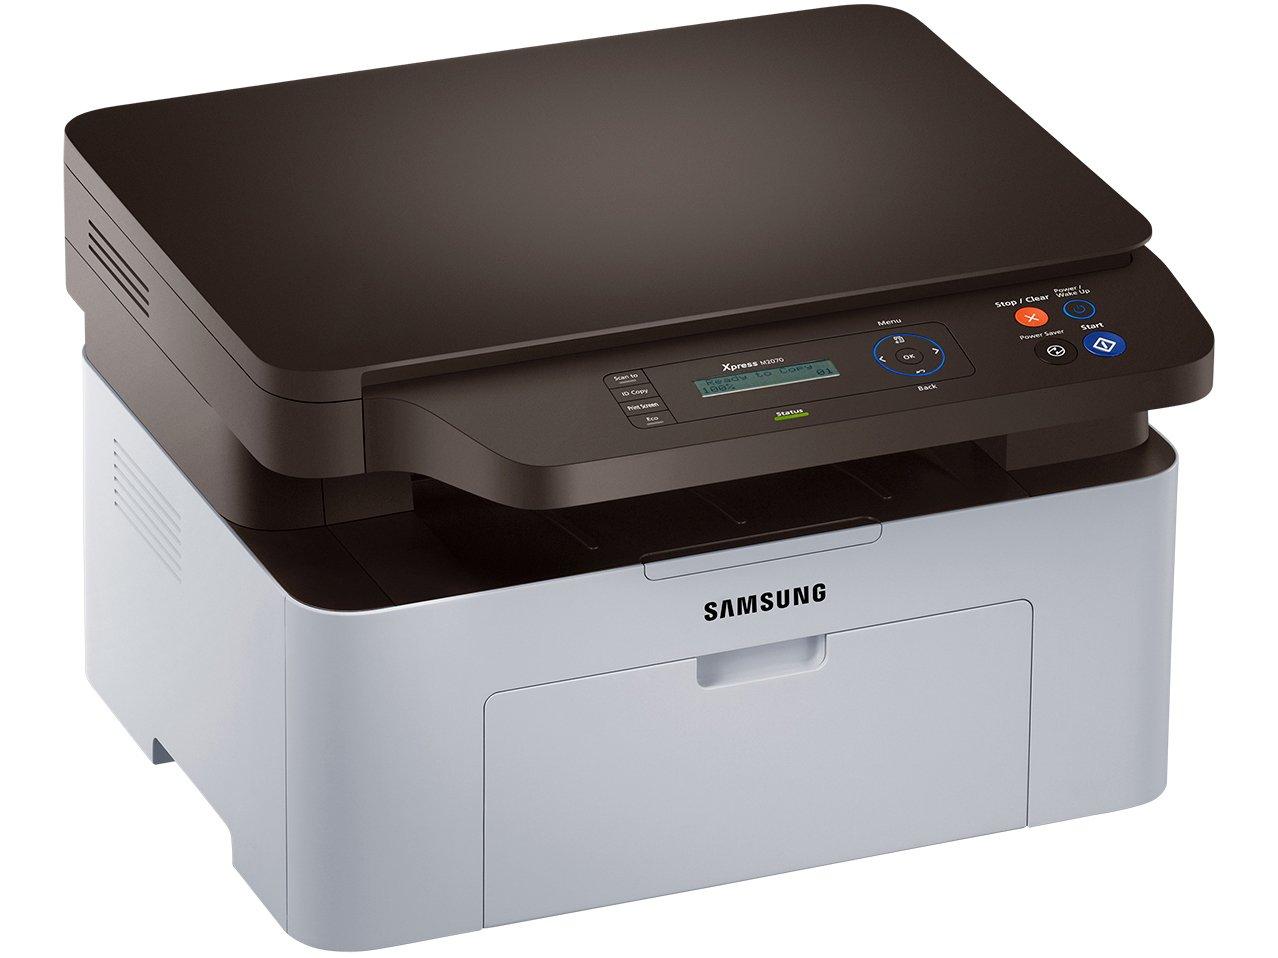 Foto 3 - Multifuncional Samsung Xpress M2070 - Monocromática Laser USB 2.0